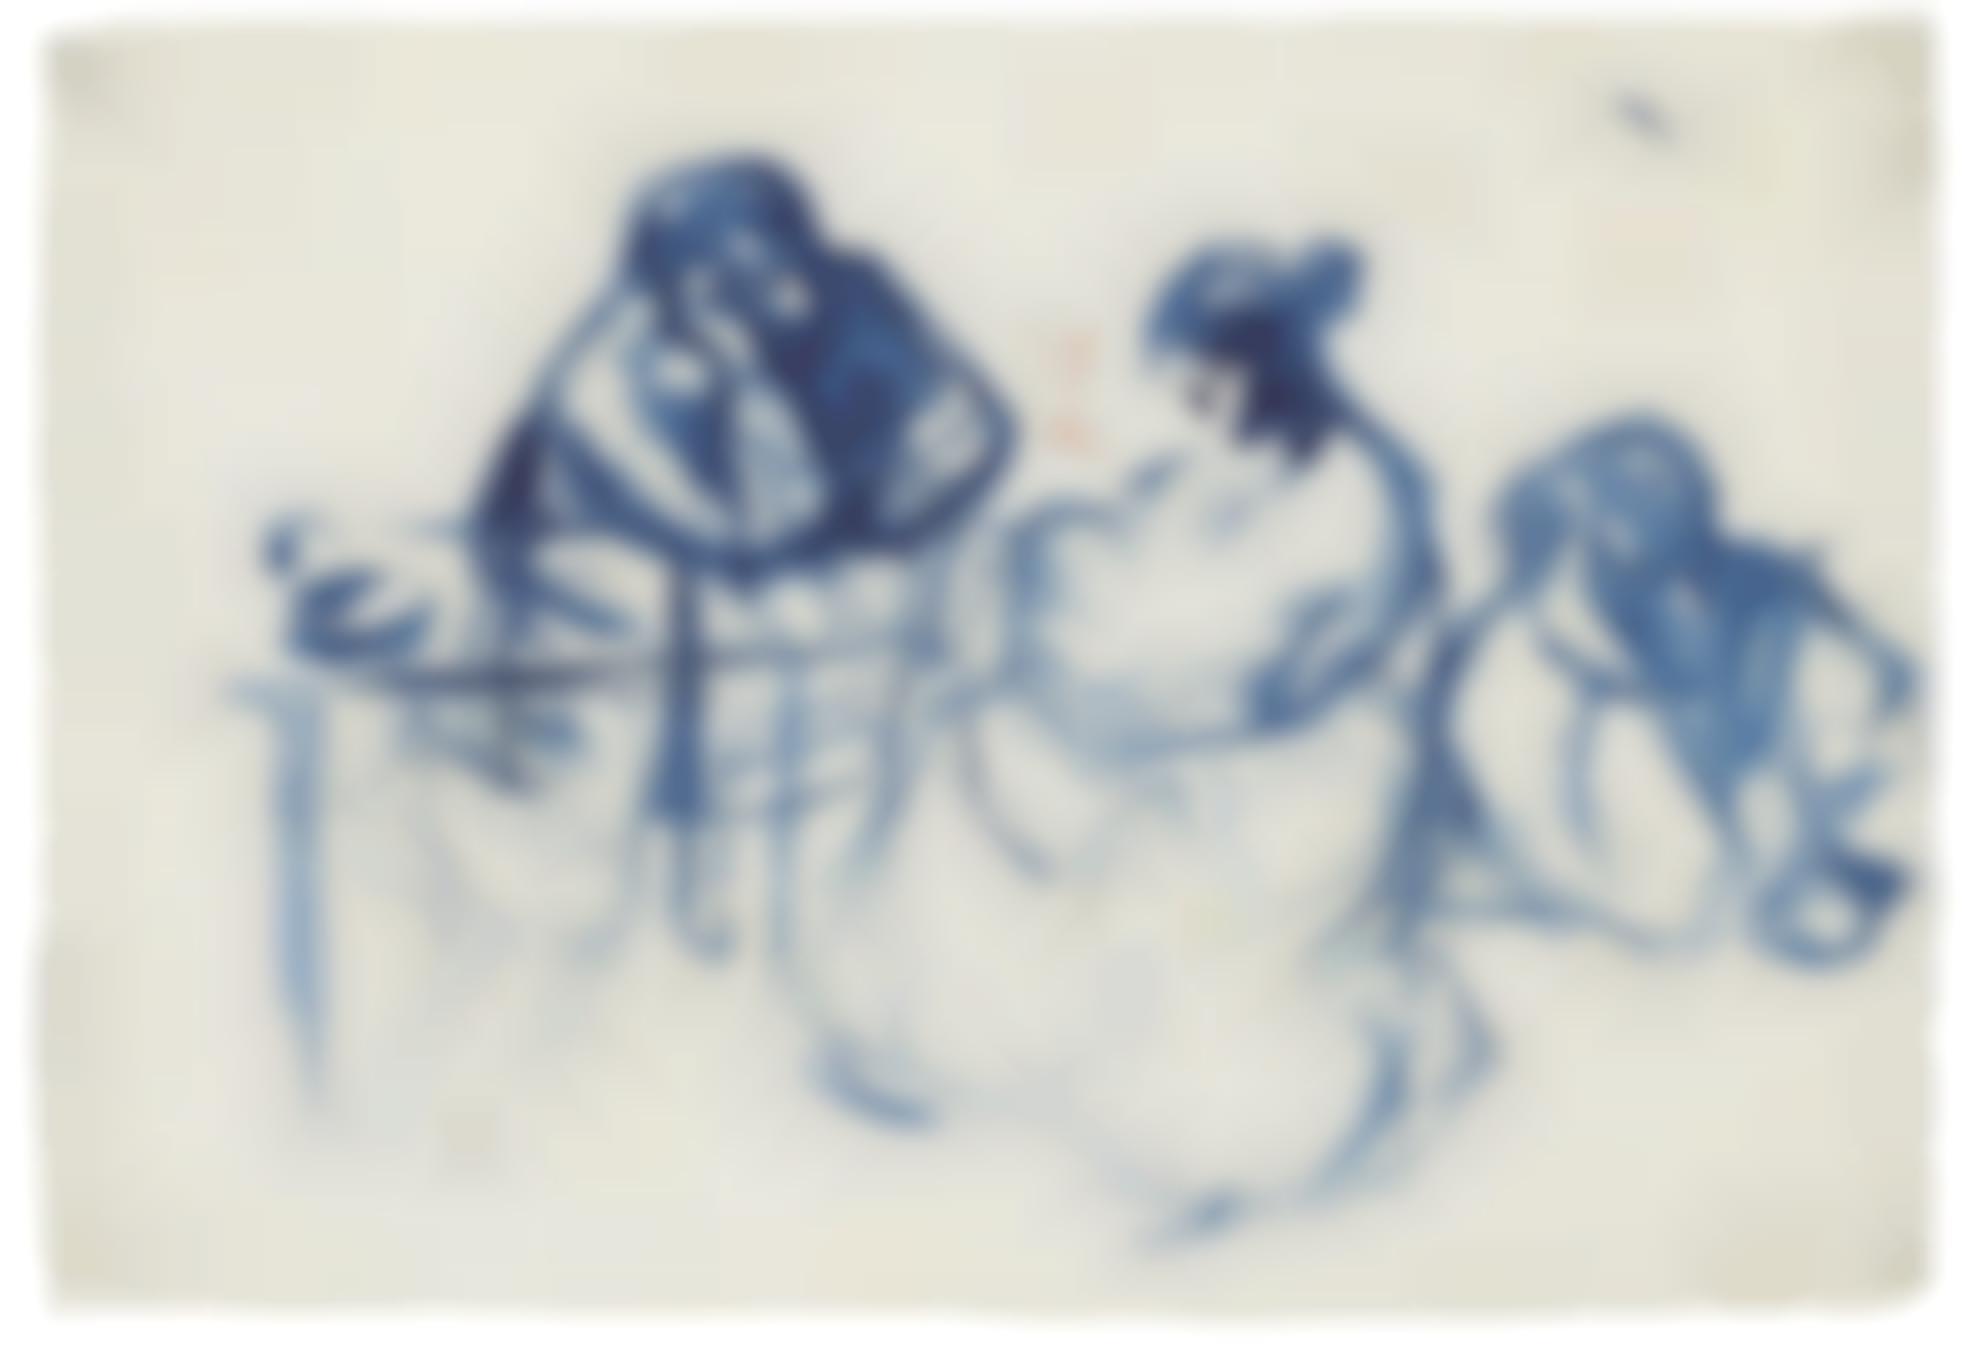 Pablo Picasso-Maternite Et Homme Attable (Recto) & Maternite (Verso): A Double-Sided Work-1899